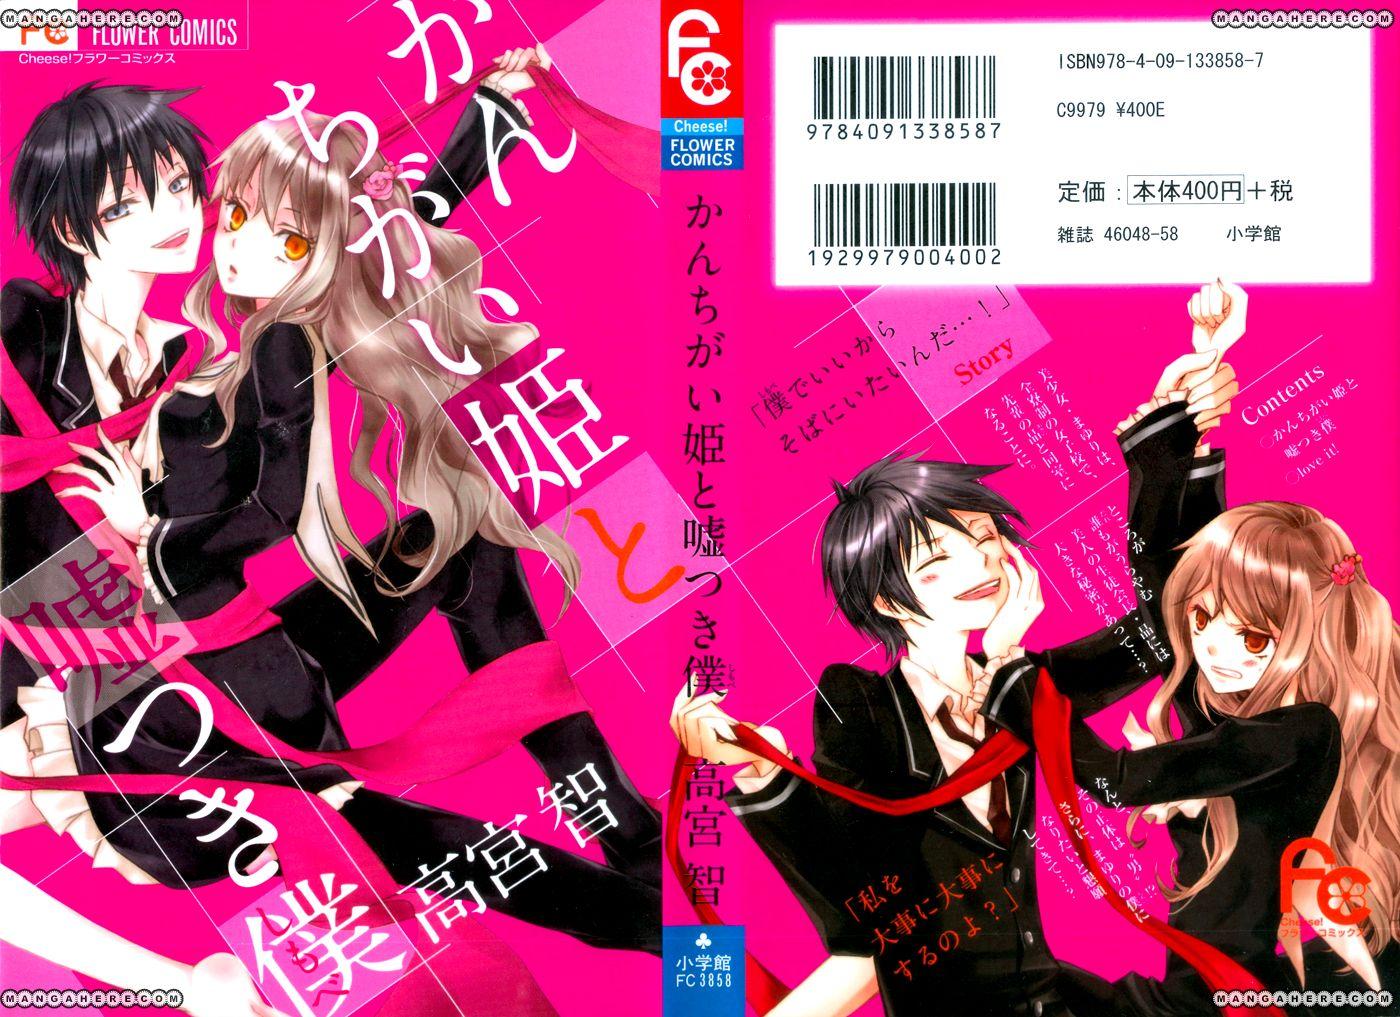 Kanchigai Hime to Usotsuki Shimobe 1 Page 1